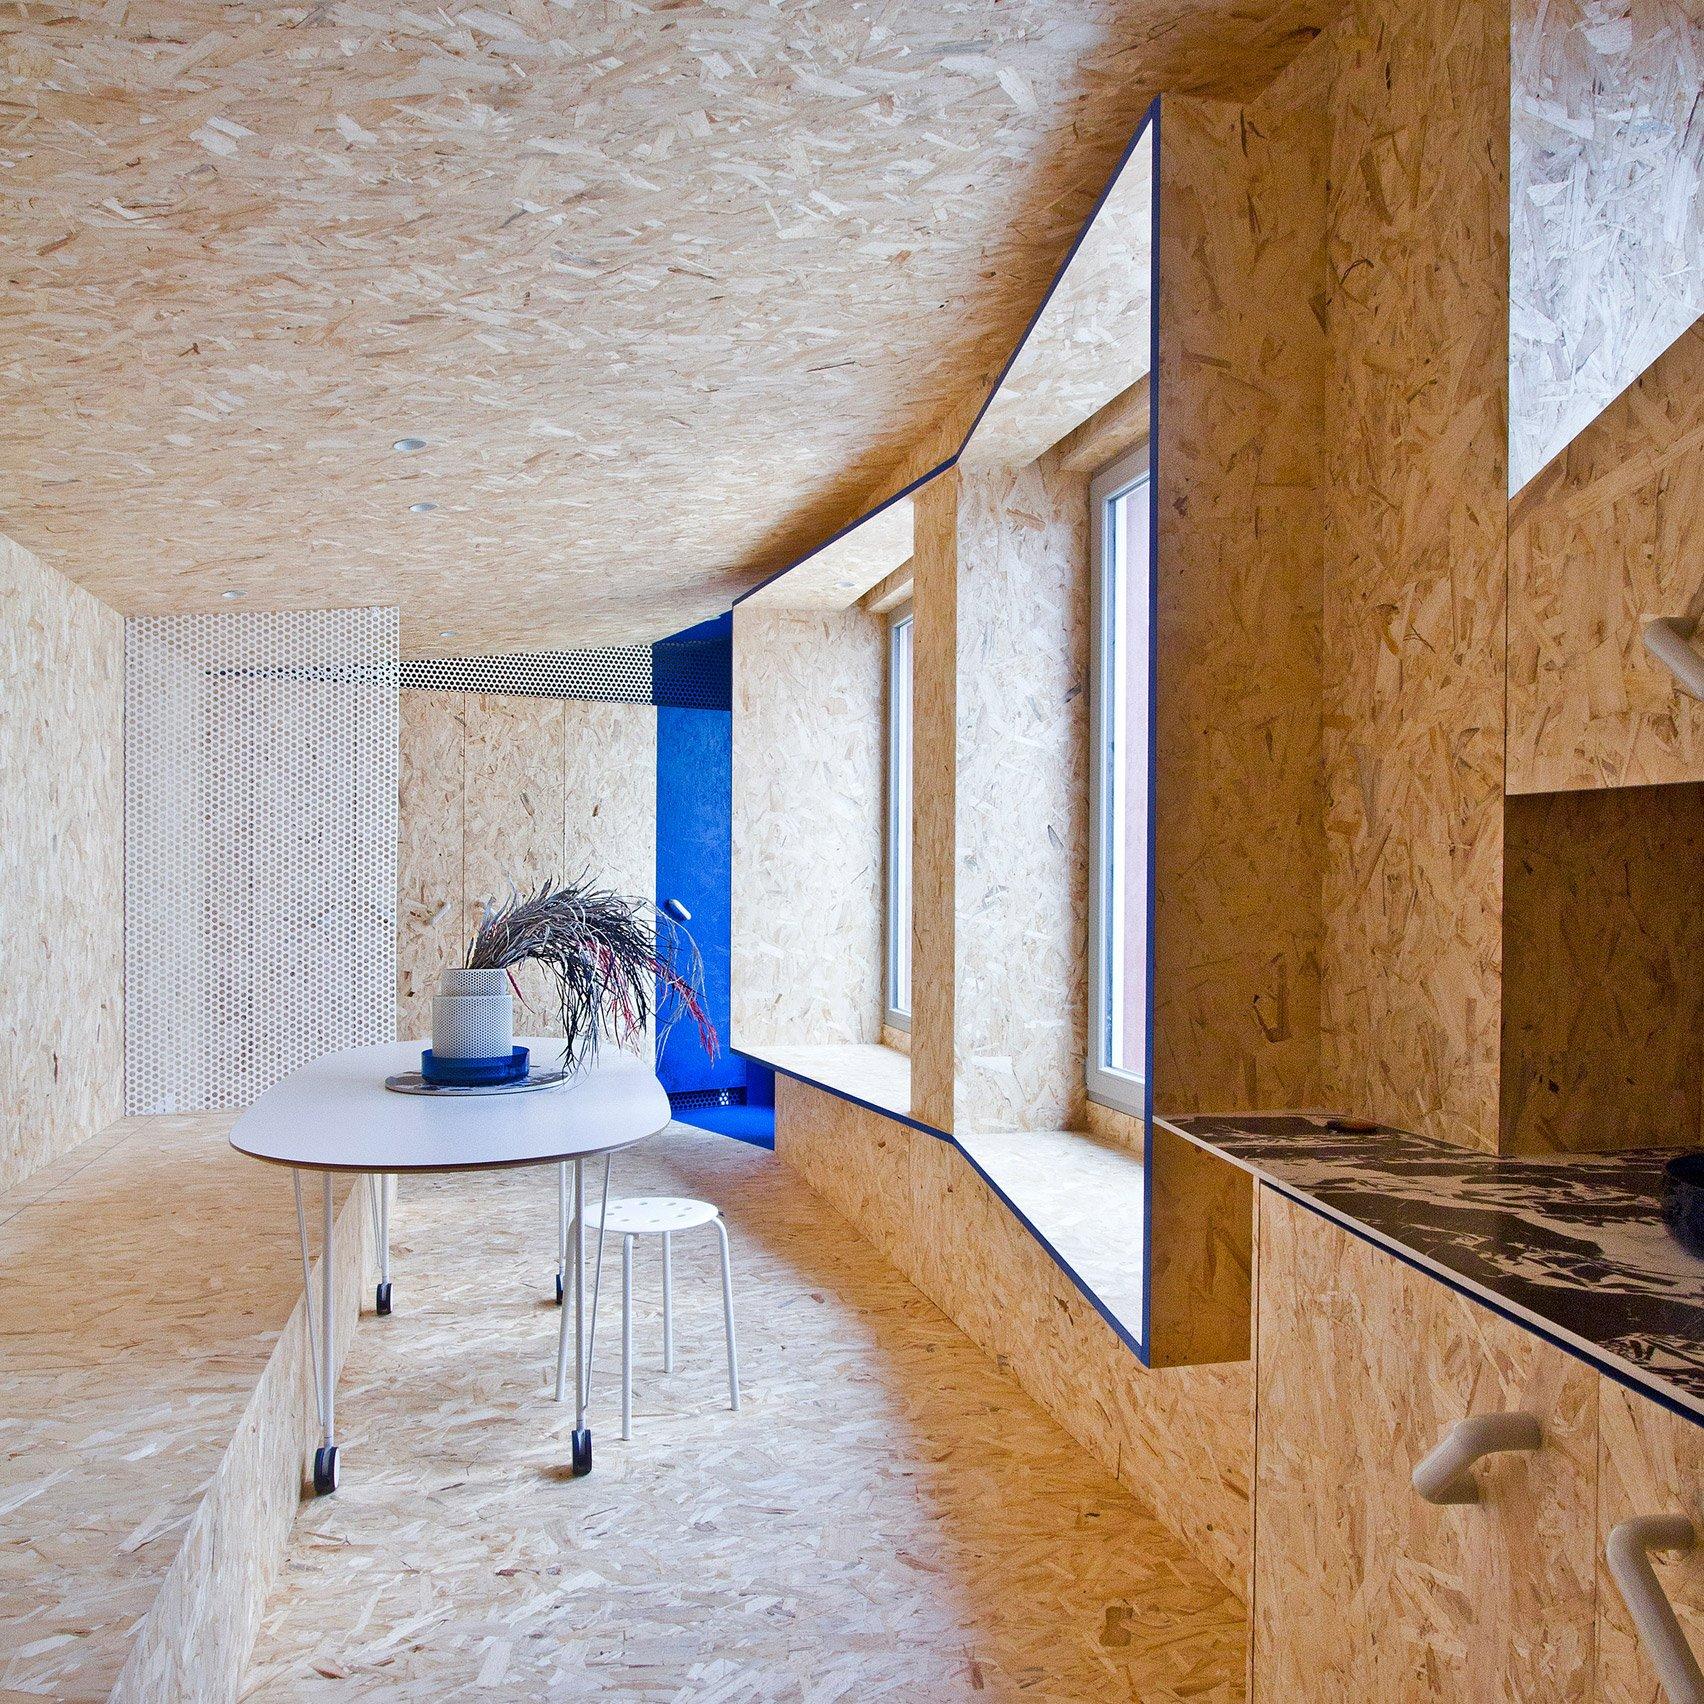 Dezeen's top home interiors of 2020: Urban Cabin by Francesca Perani